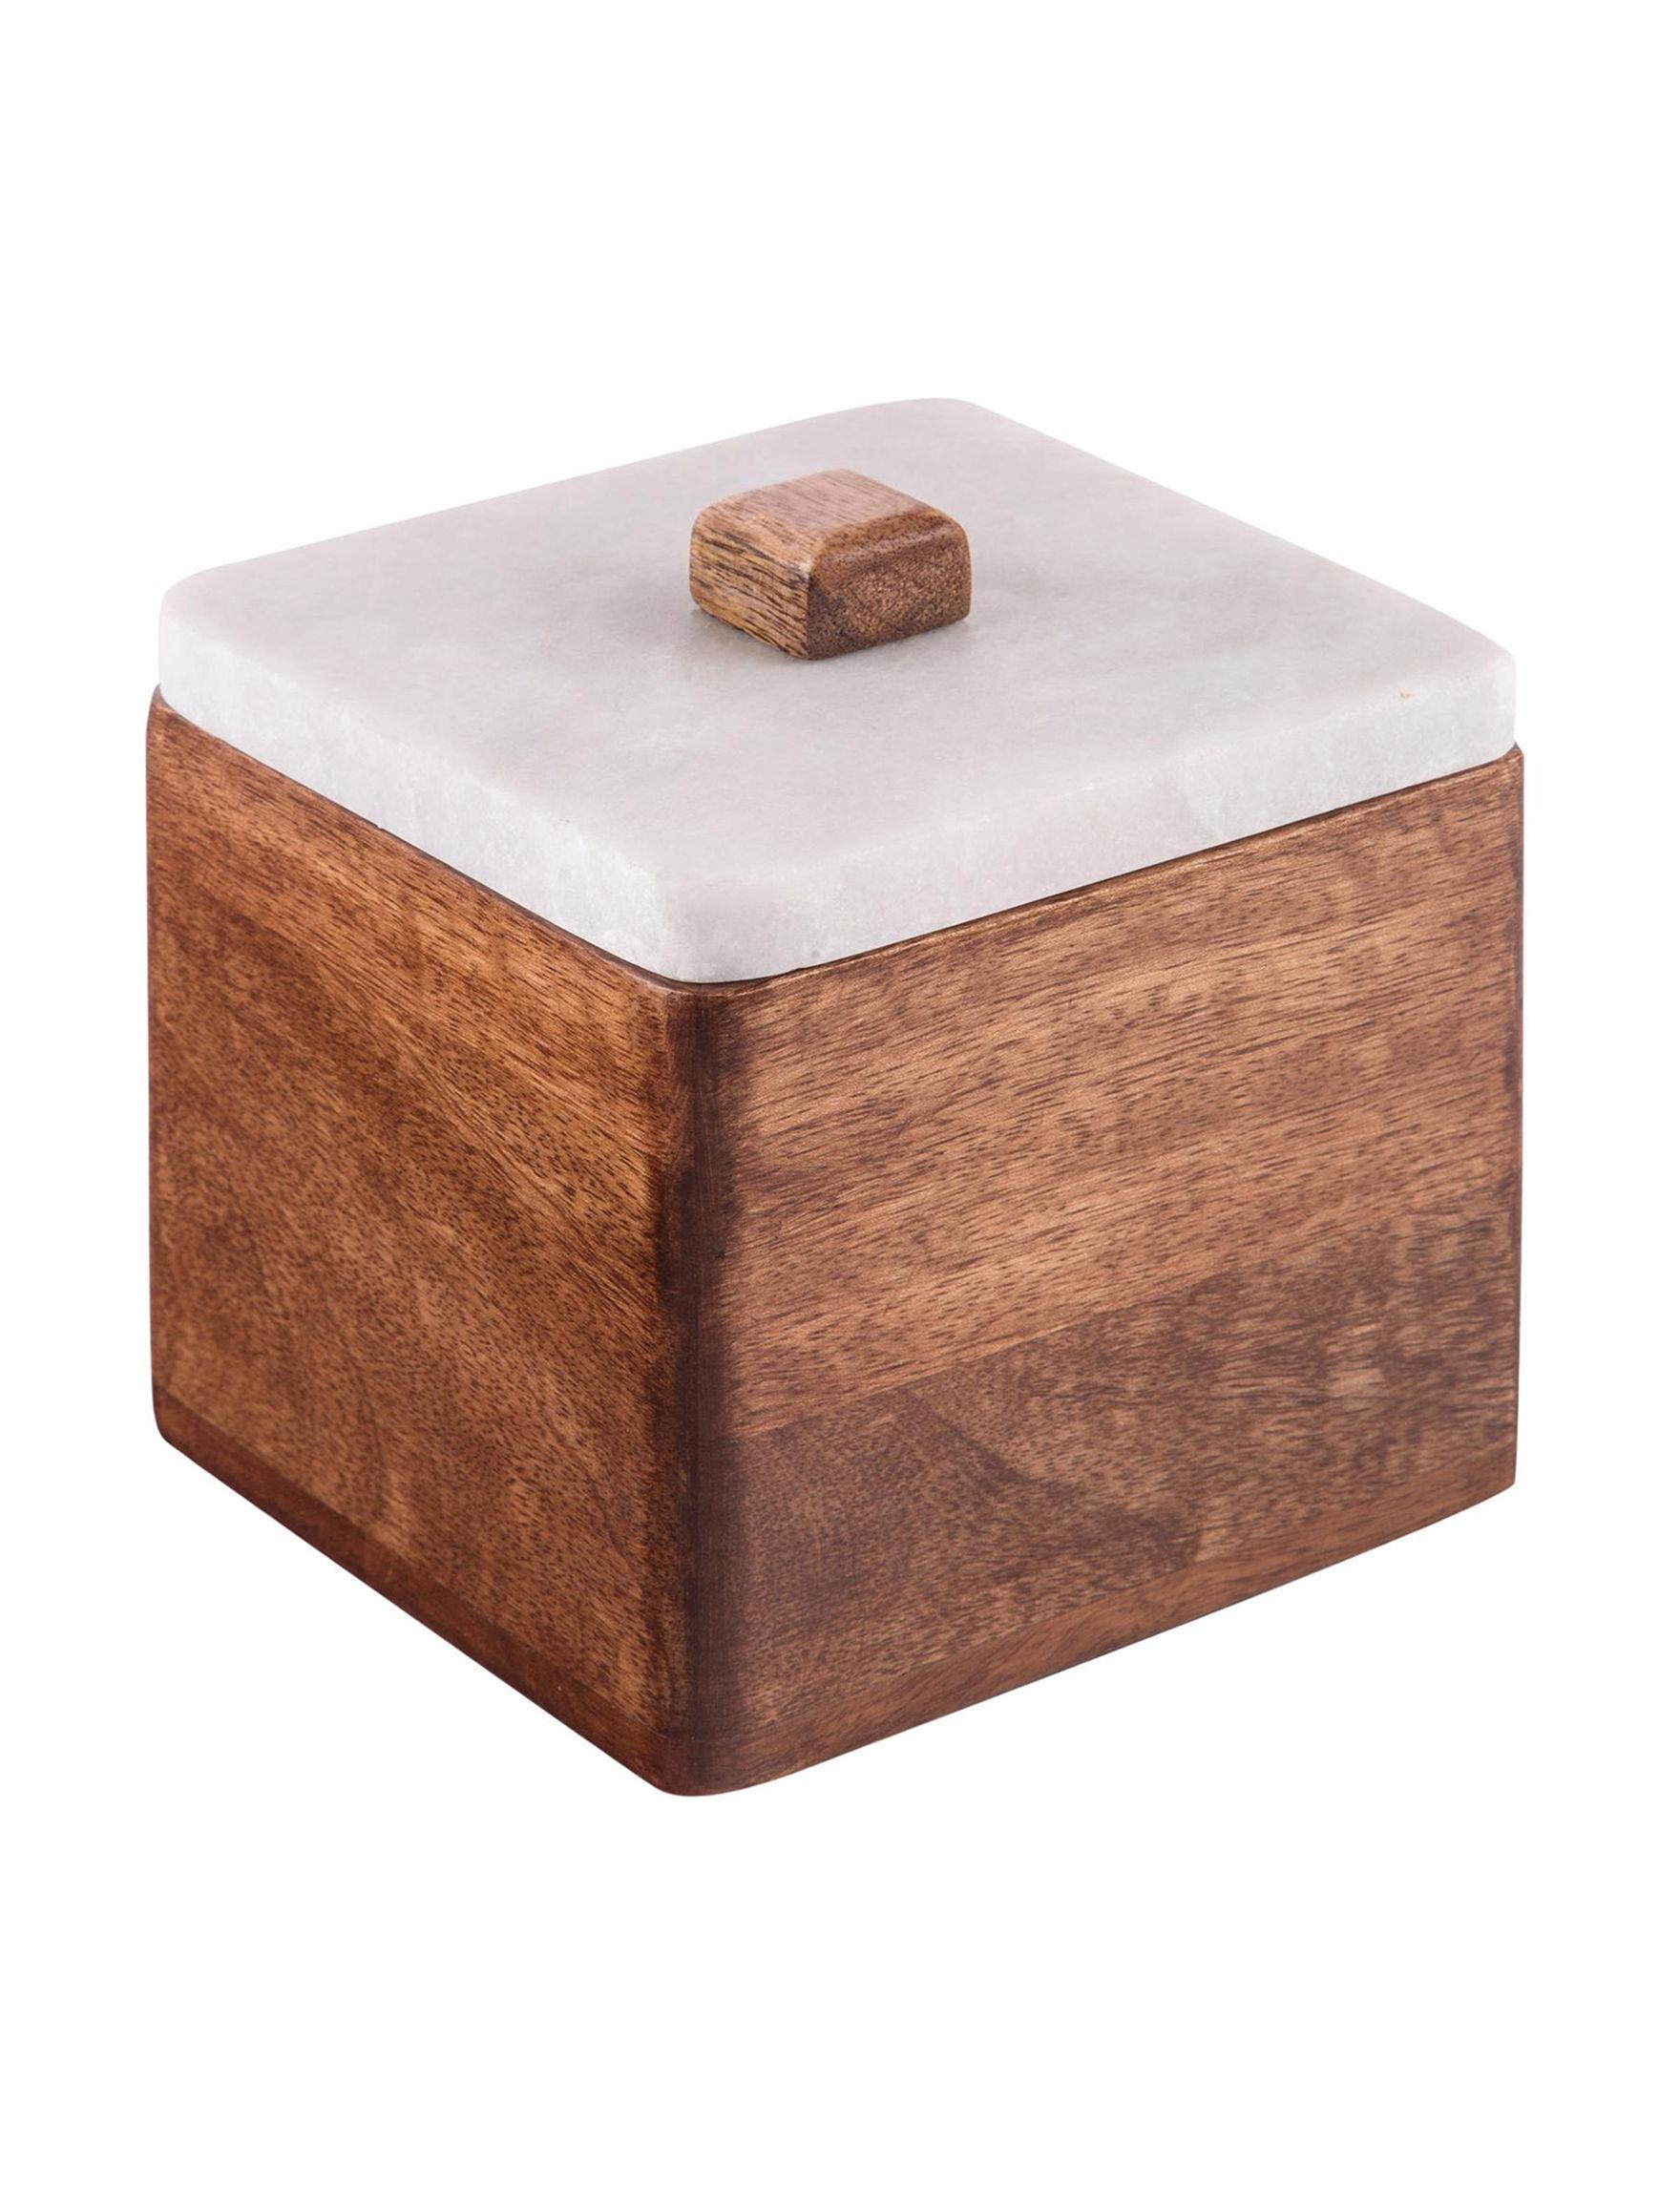 Home Essentials Brown / White Decorative Objects Jewelry Storage & Organization